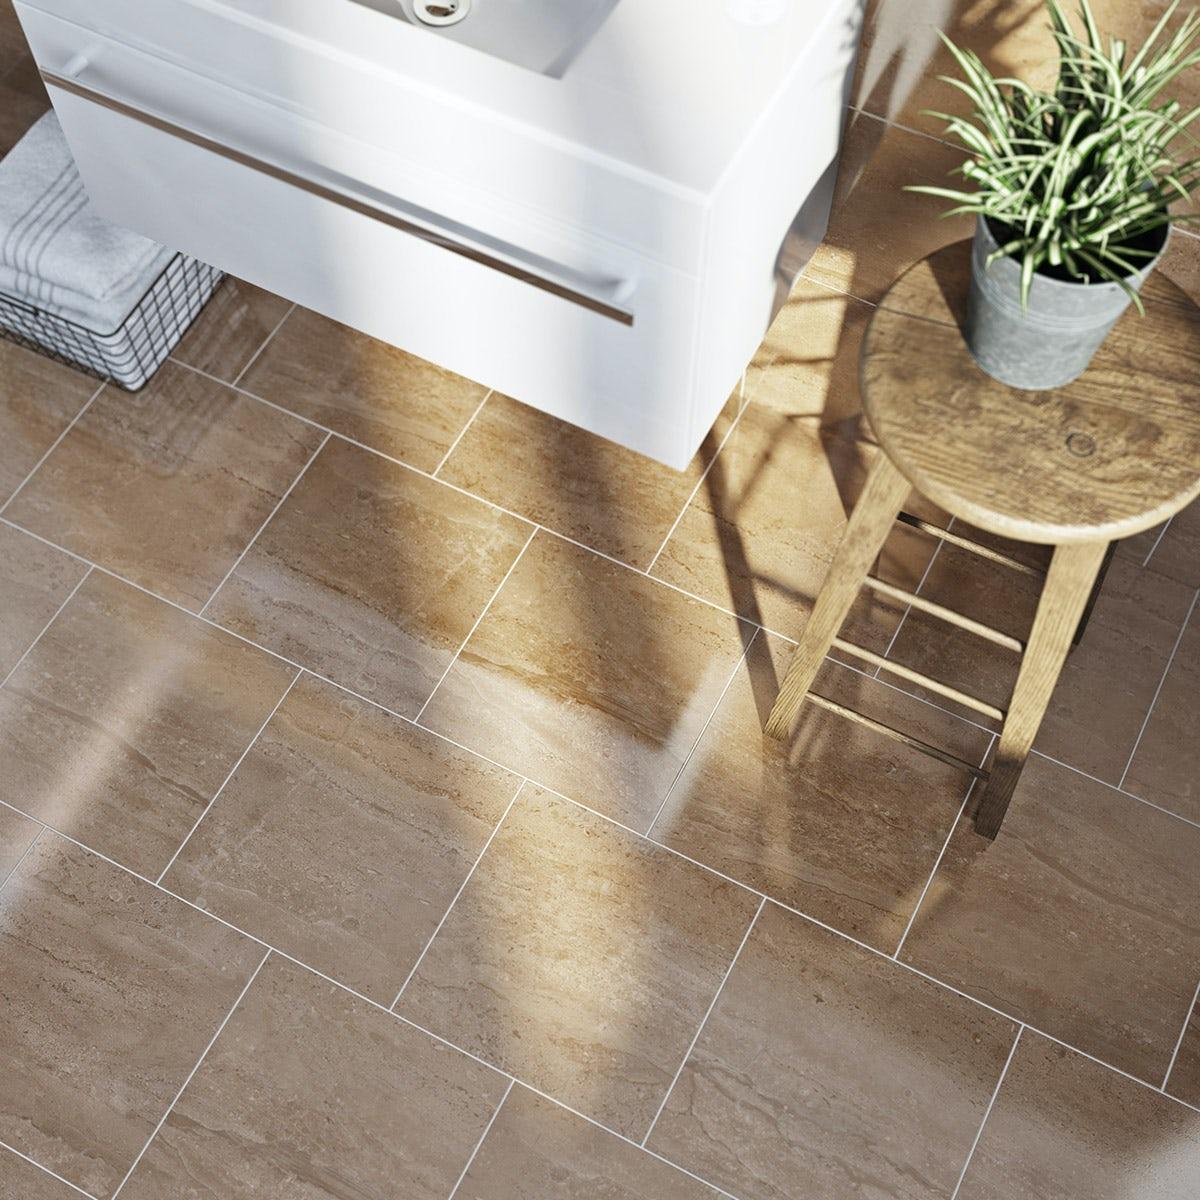 British ceramic tile lux sand beige gloss tile 331mm x 331mm british ceramic tile lux sand beige gloss tile 331mm x 331mm dailygadgetfo Images